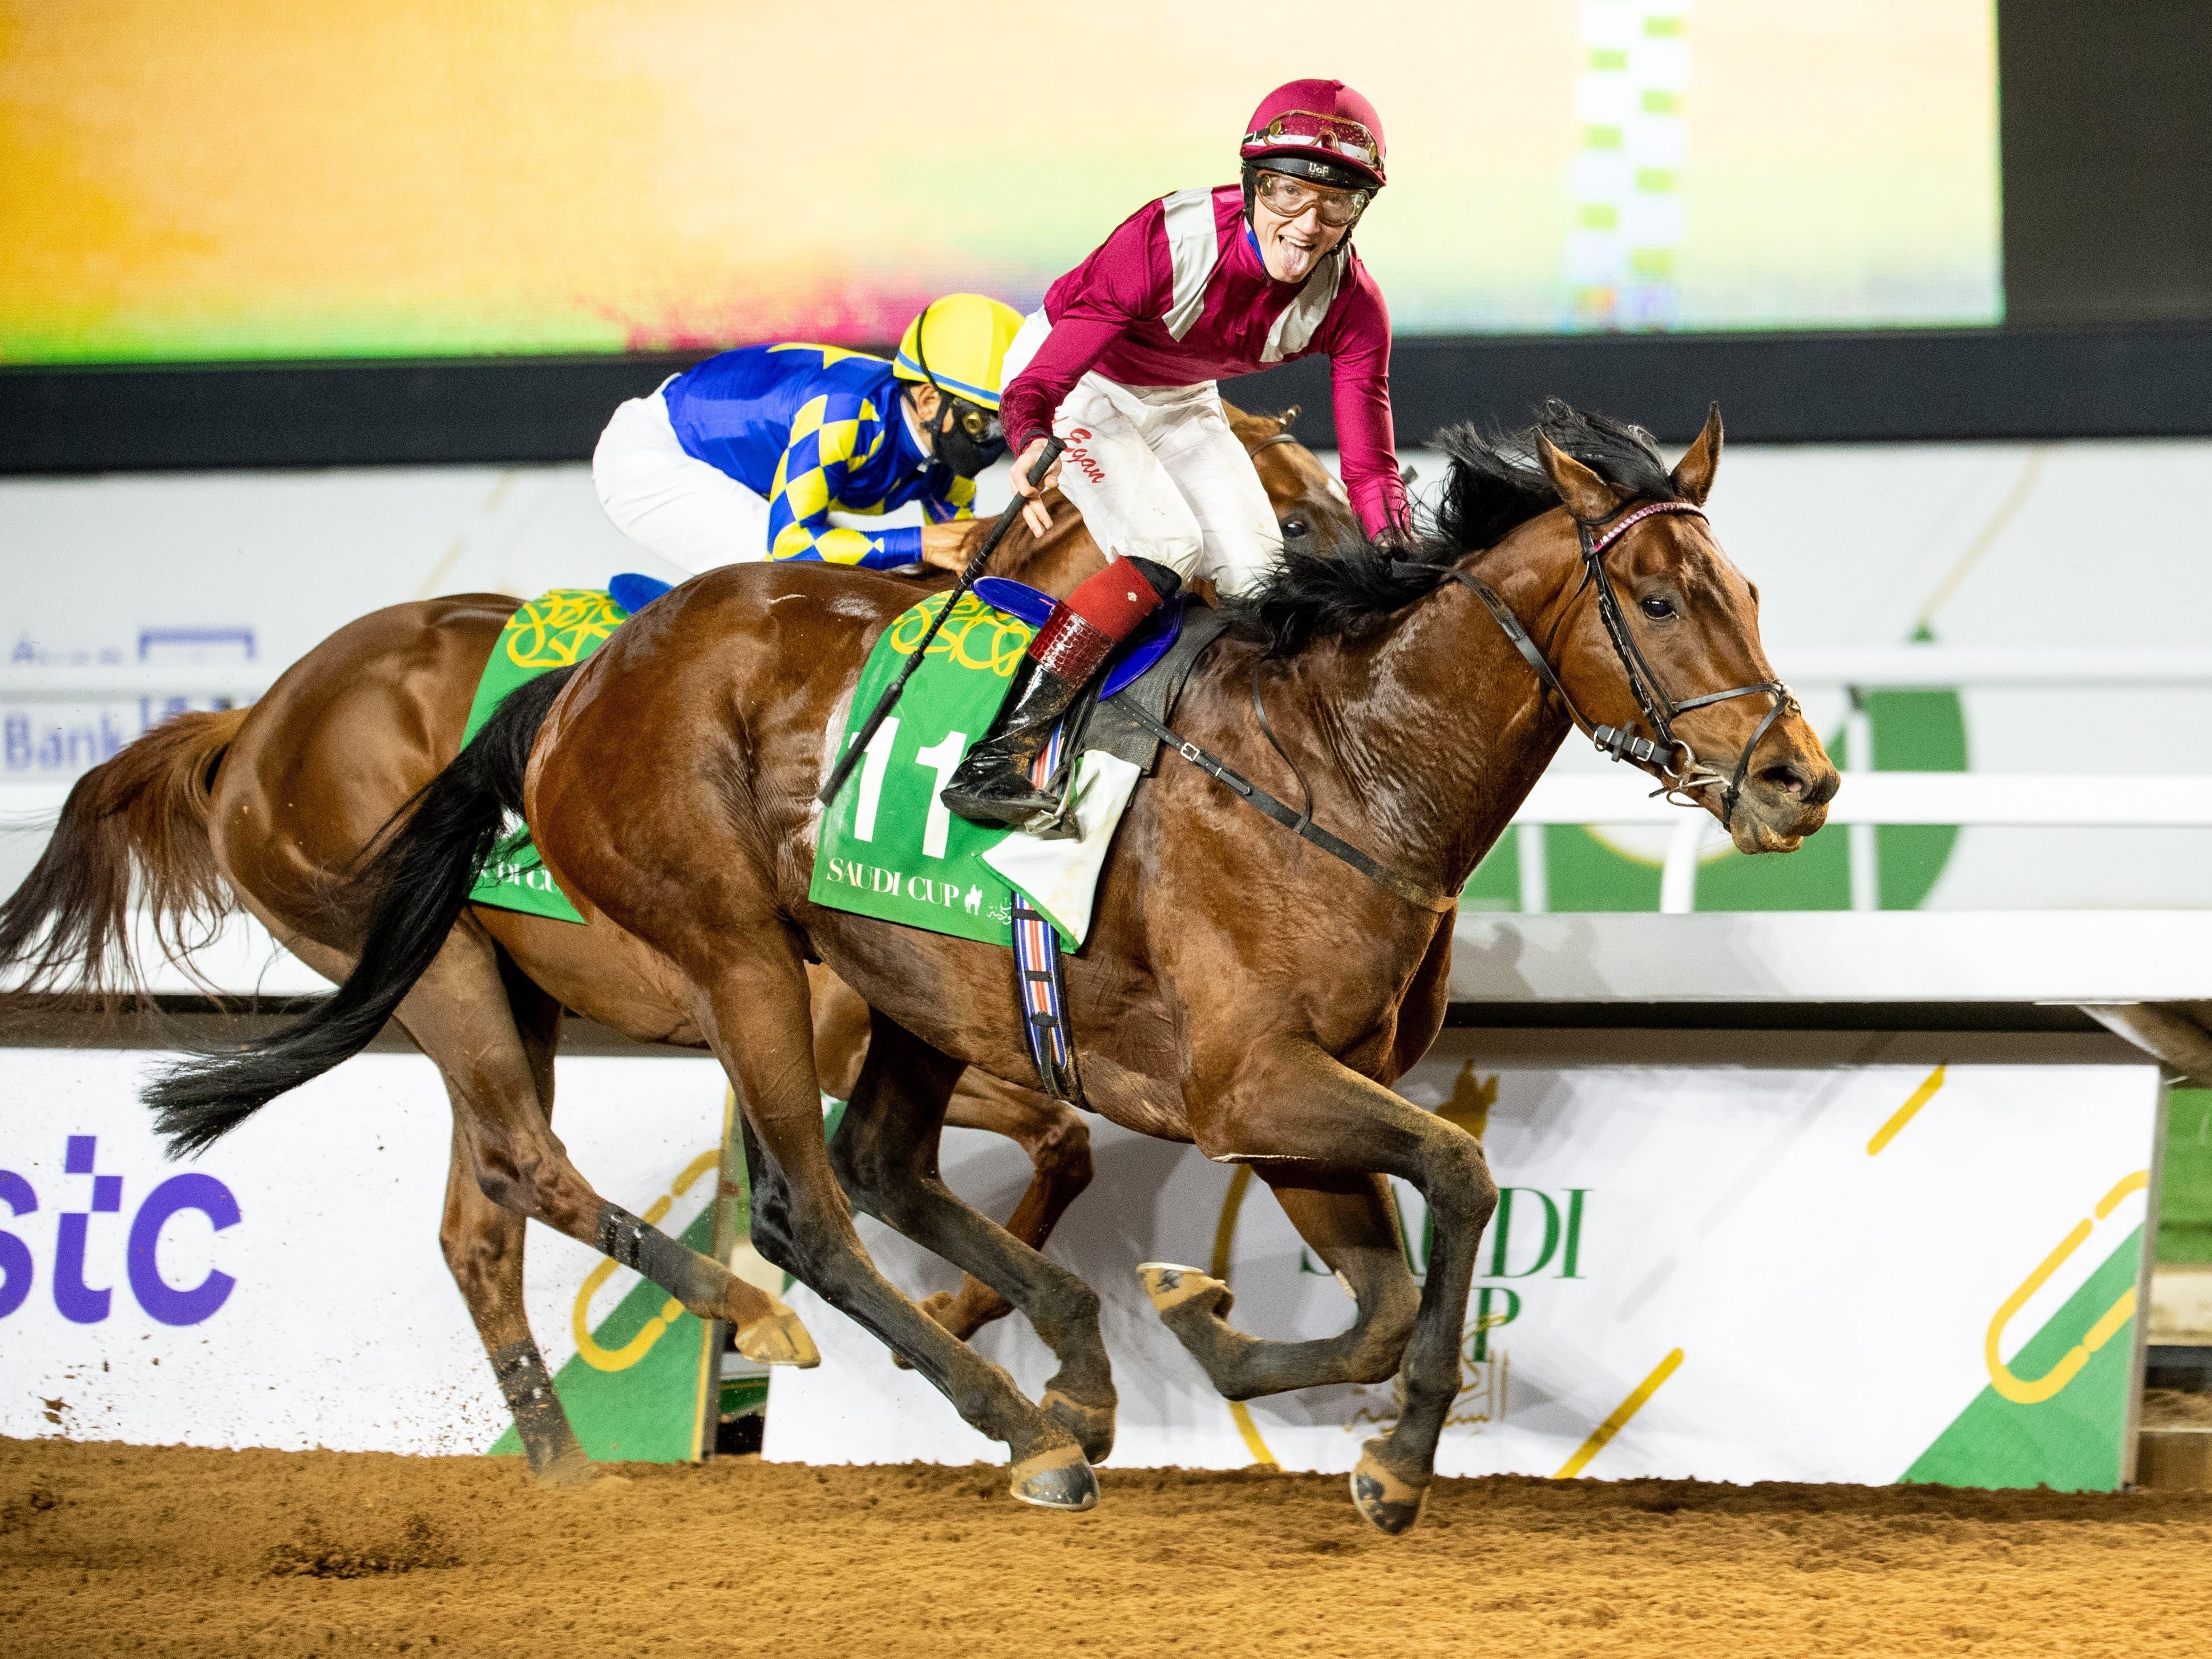 Glory for David Egan and Mishriff in the Saudi Cup (Jockey Club of Saudi Arabia/Douglas DeFelice)